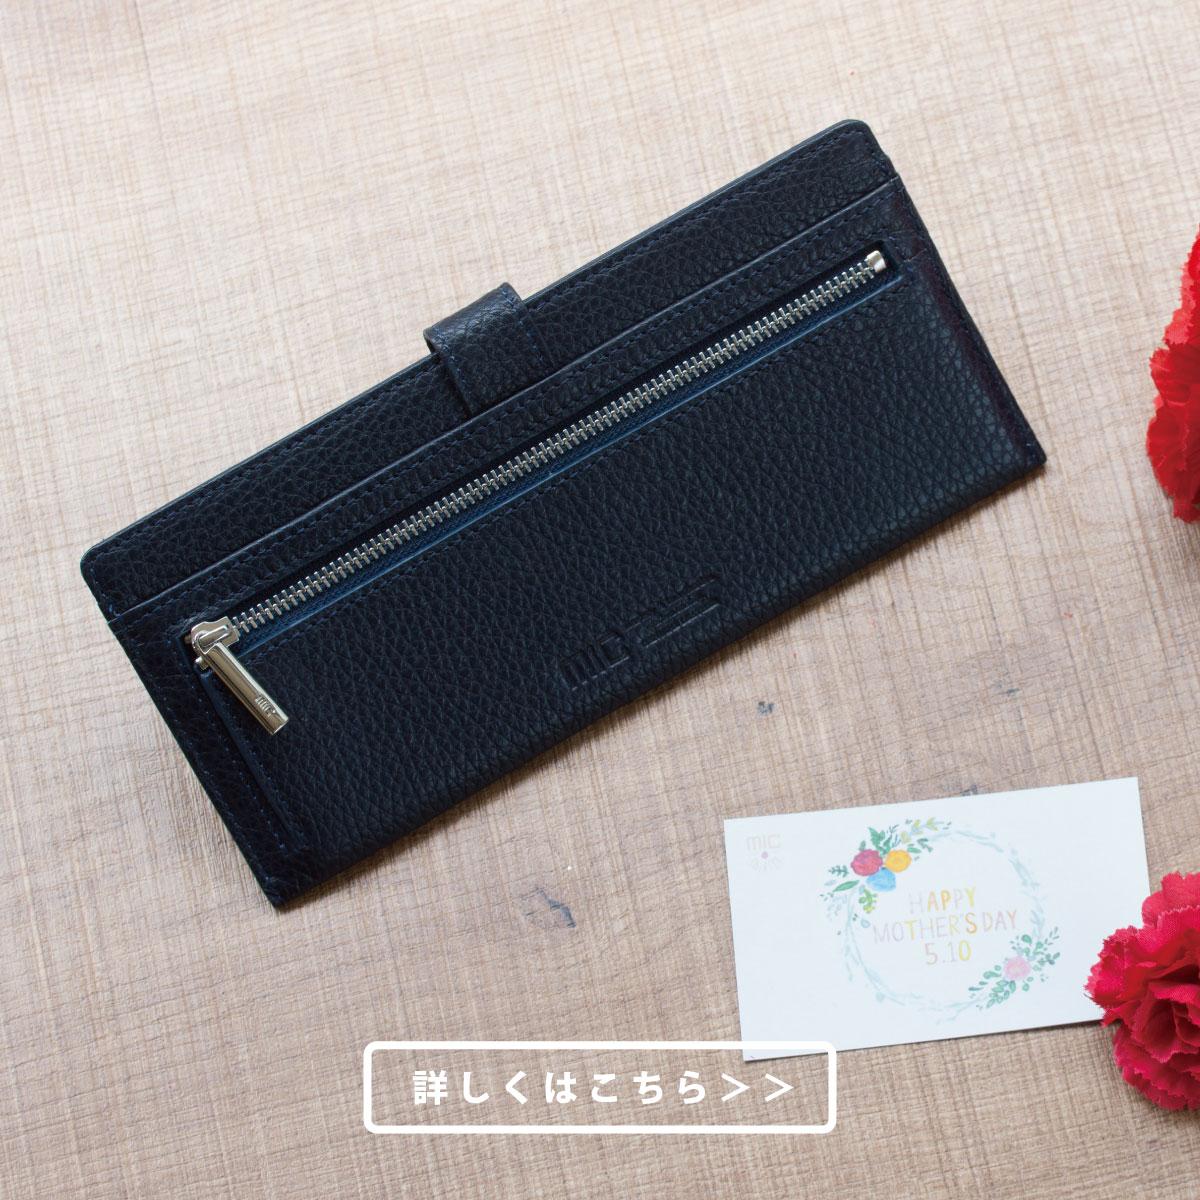 MH1364 シュランク 薄型長財布(小銭入れ付き)